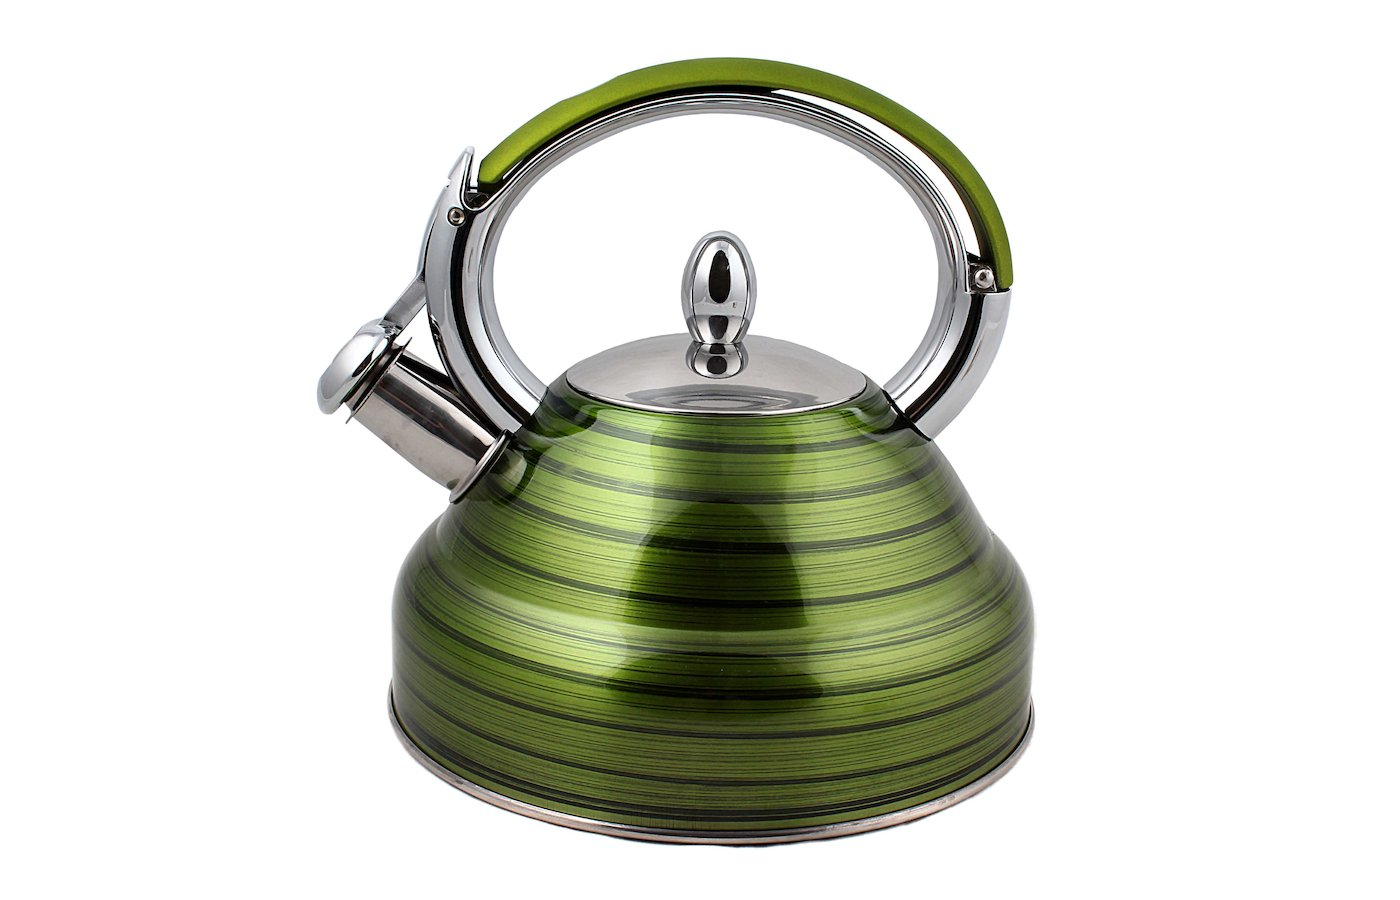 чайник металлический Mayer Boch 23205 2.7л